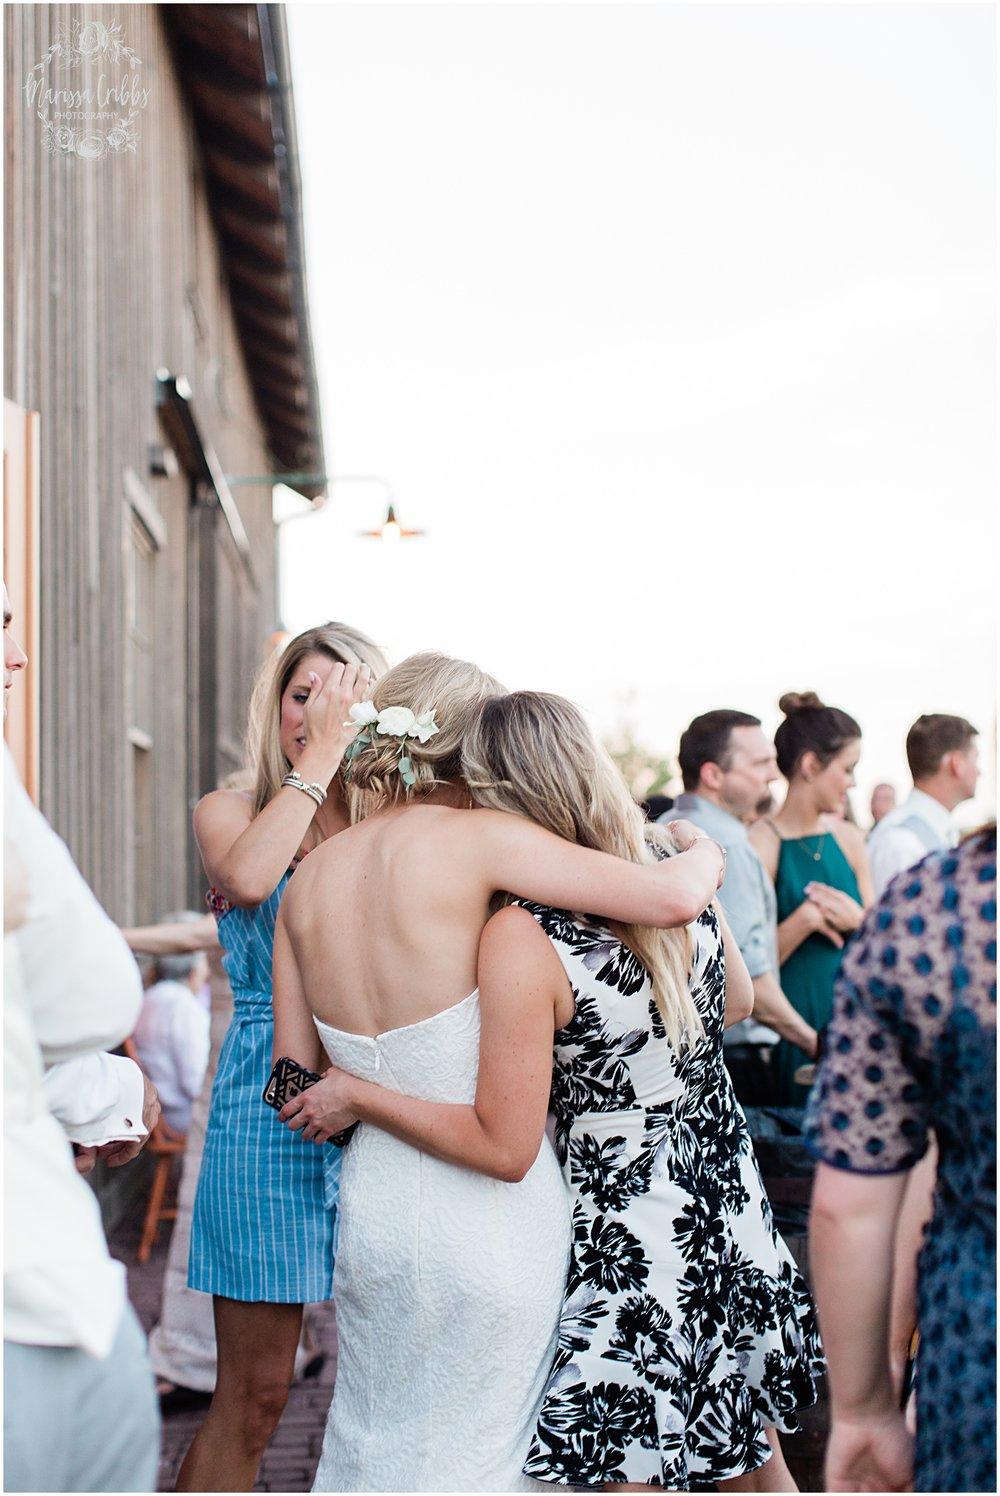 RHODES WEDDING | WESTON RED BARN FARM | MARISSA CRIBBS PHOTOGRAPHY_5330.jpg